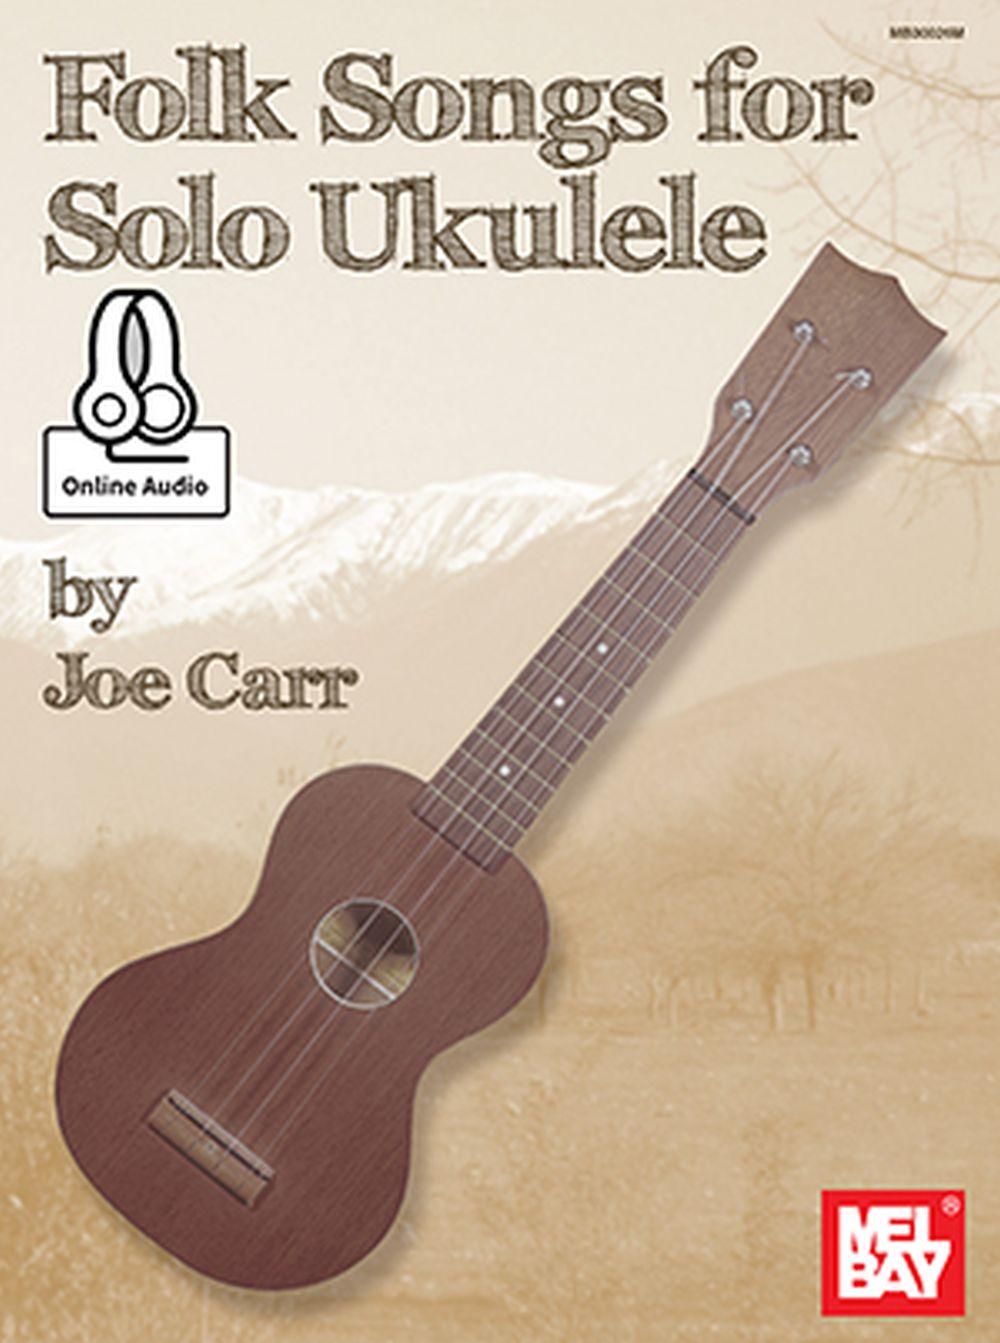 Folk Songs For Solo Ukulele